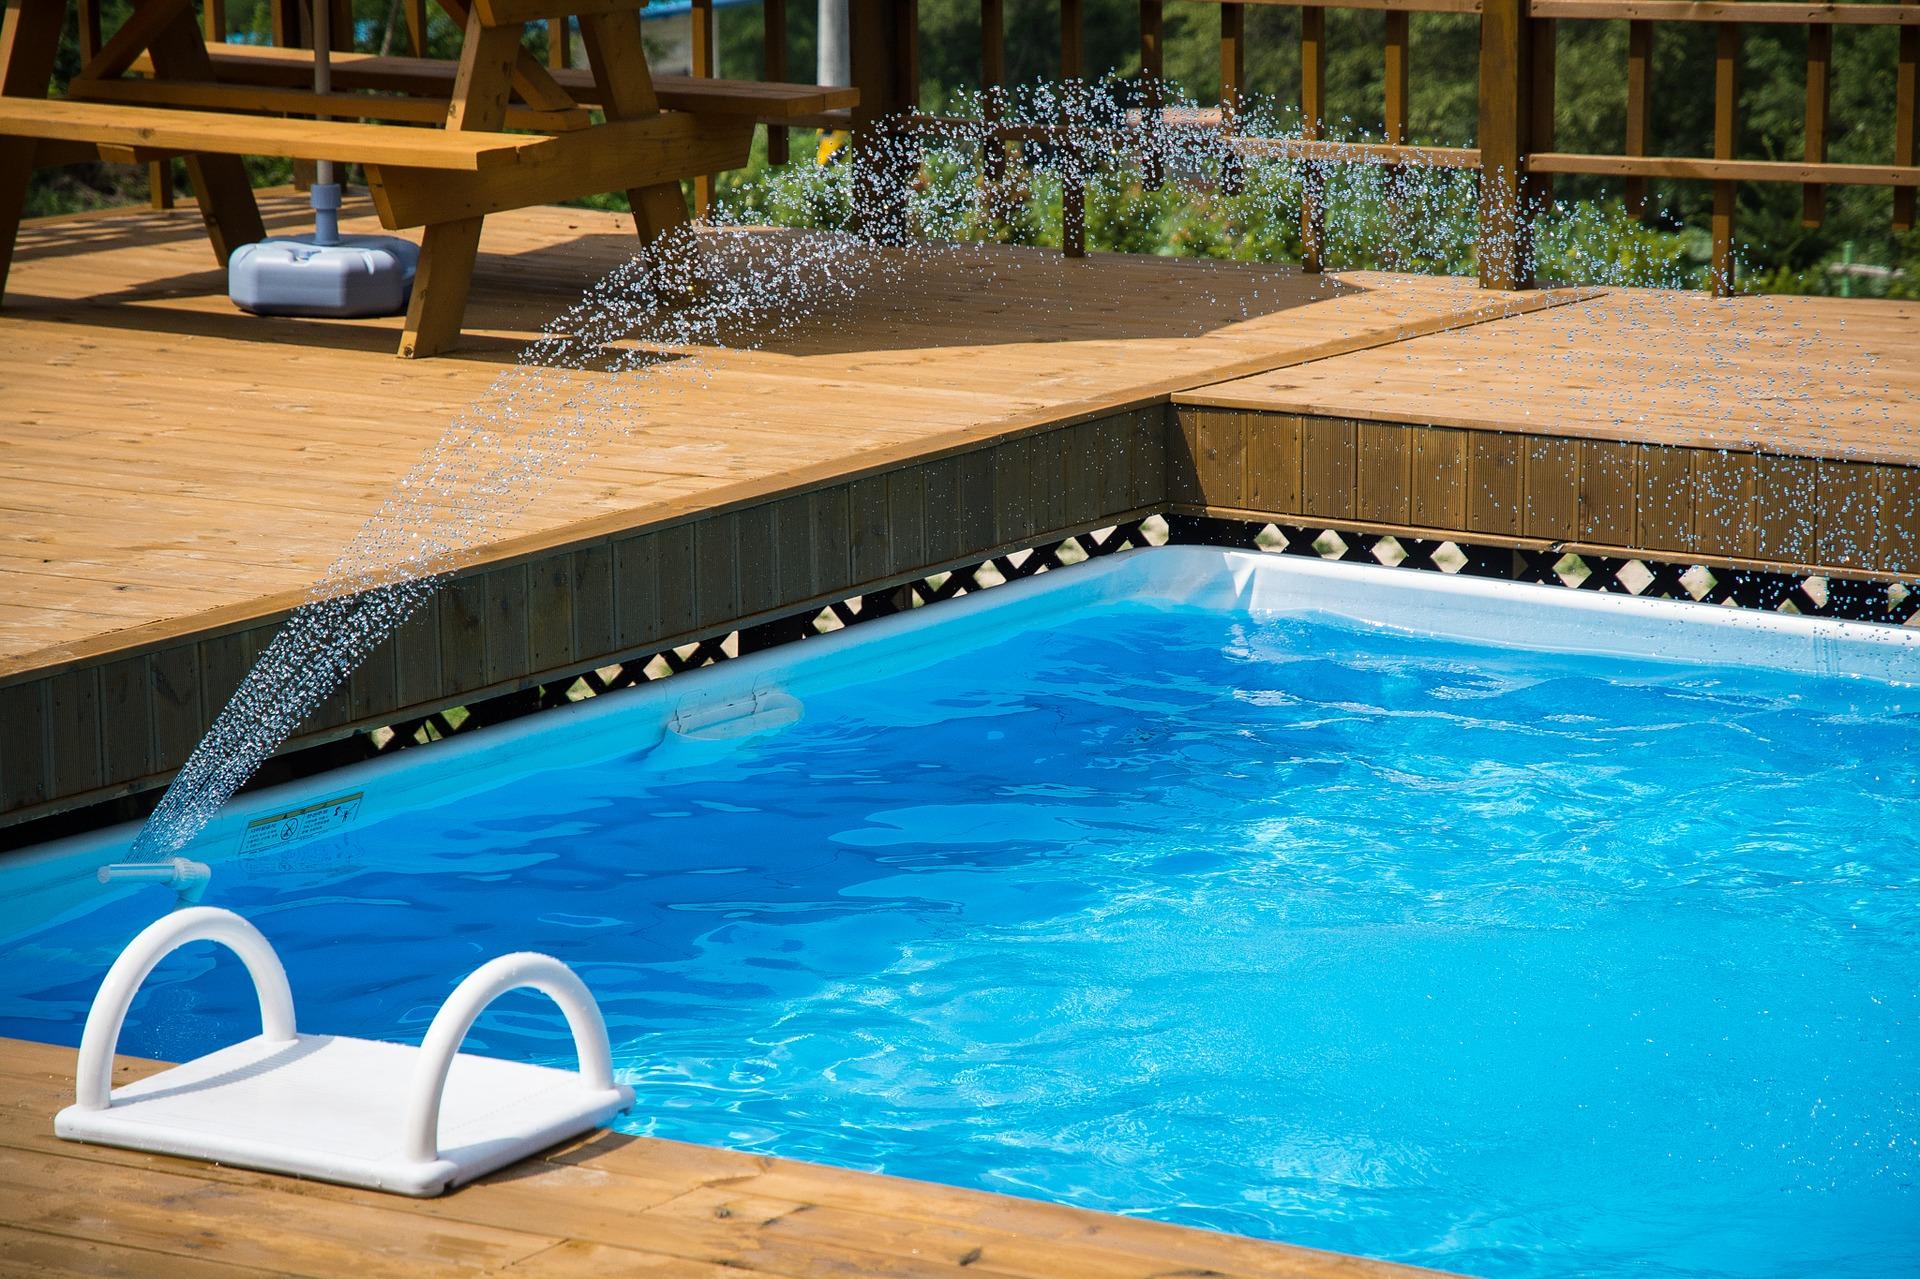 Pool Equipment Installation In Las Vegas Nv Quality